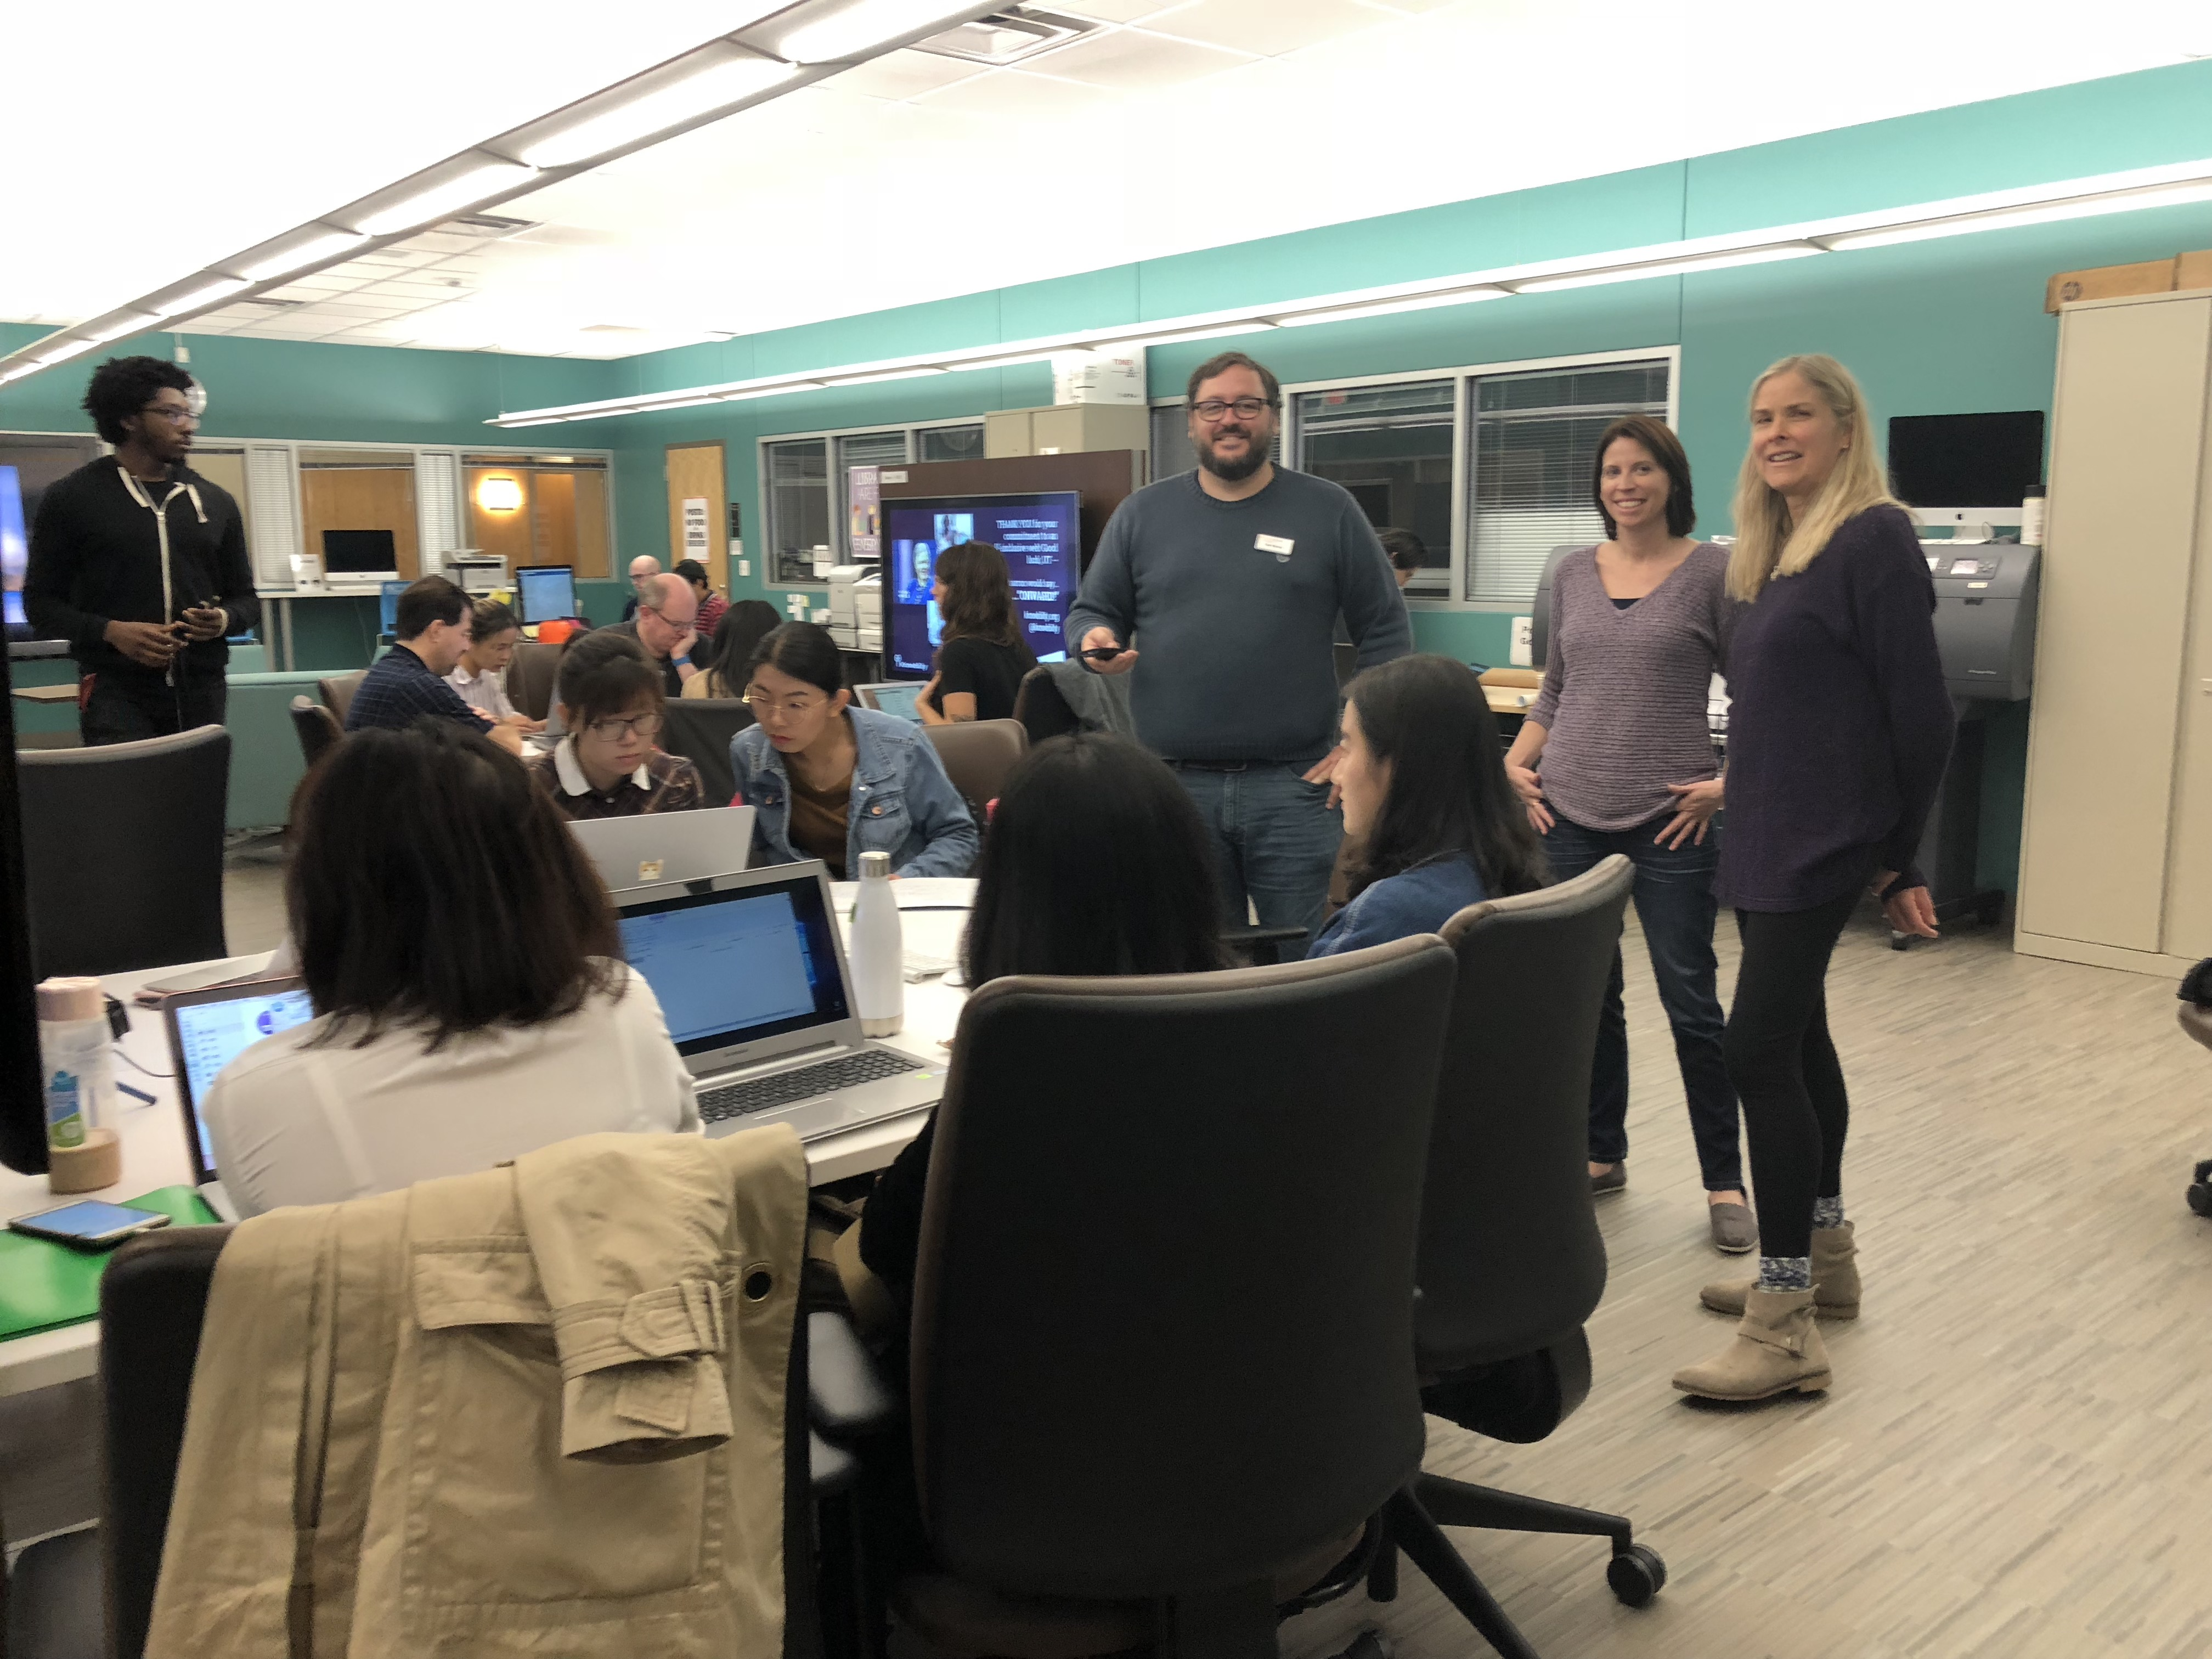 Student volunteer teams working in a computer lab.